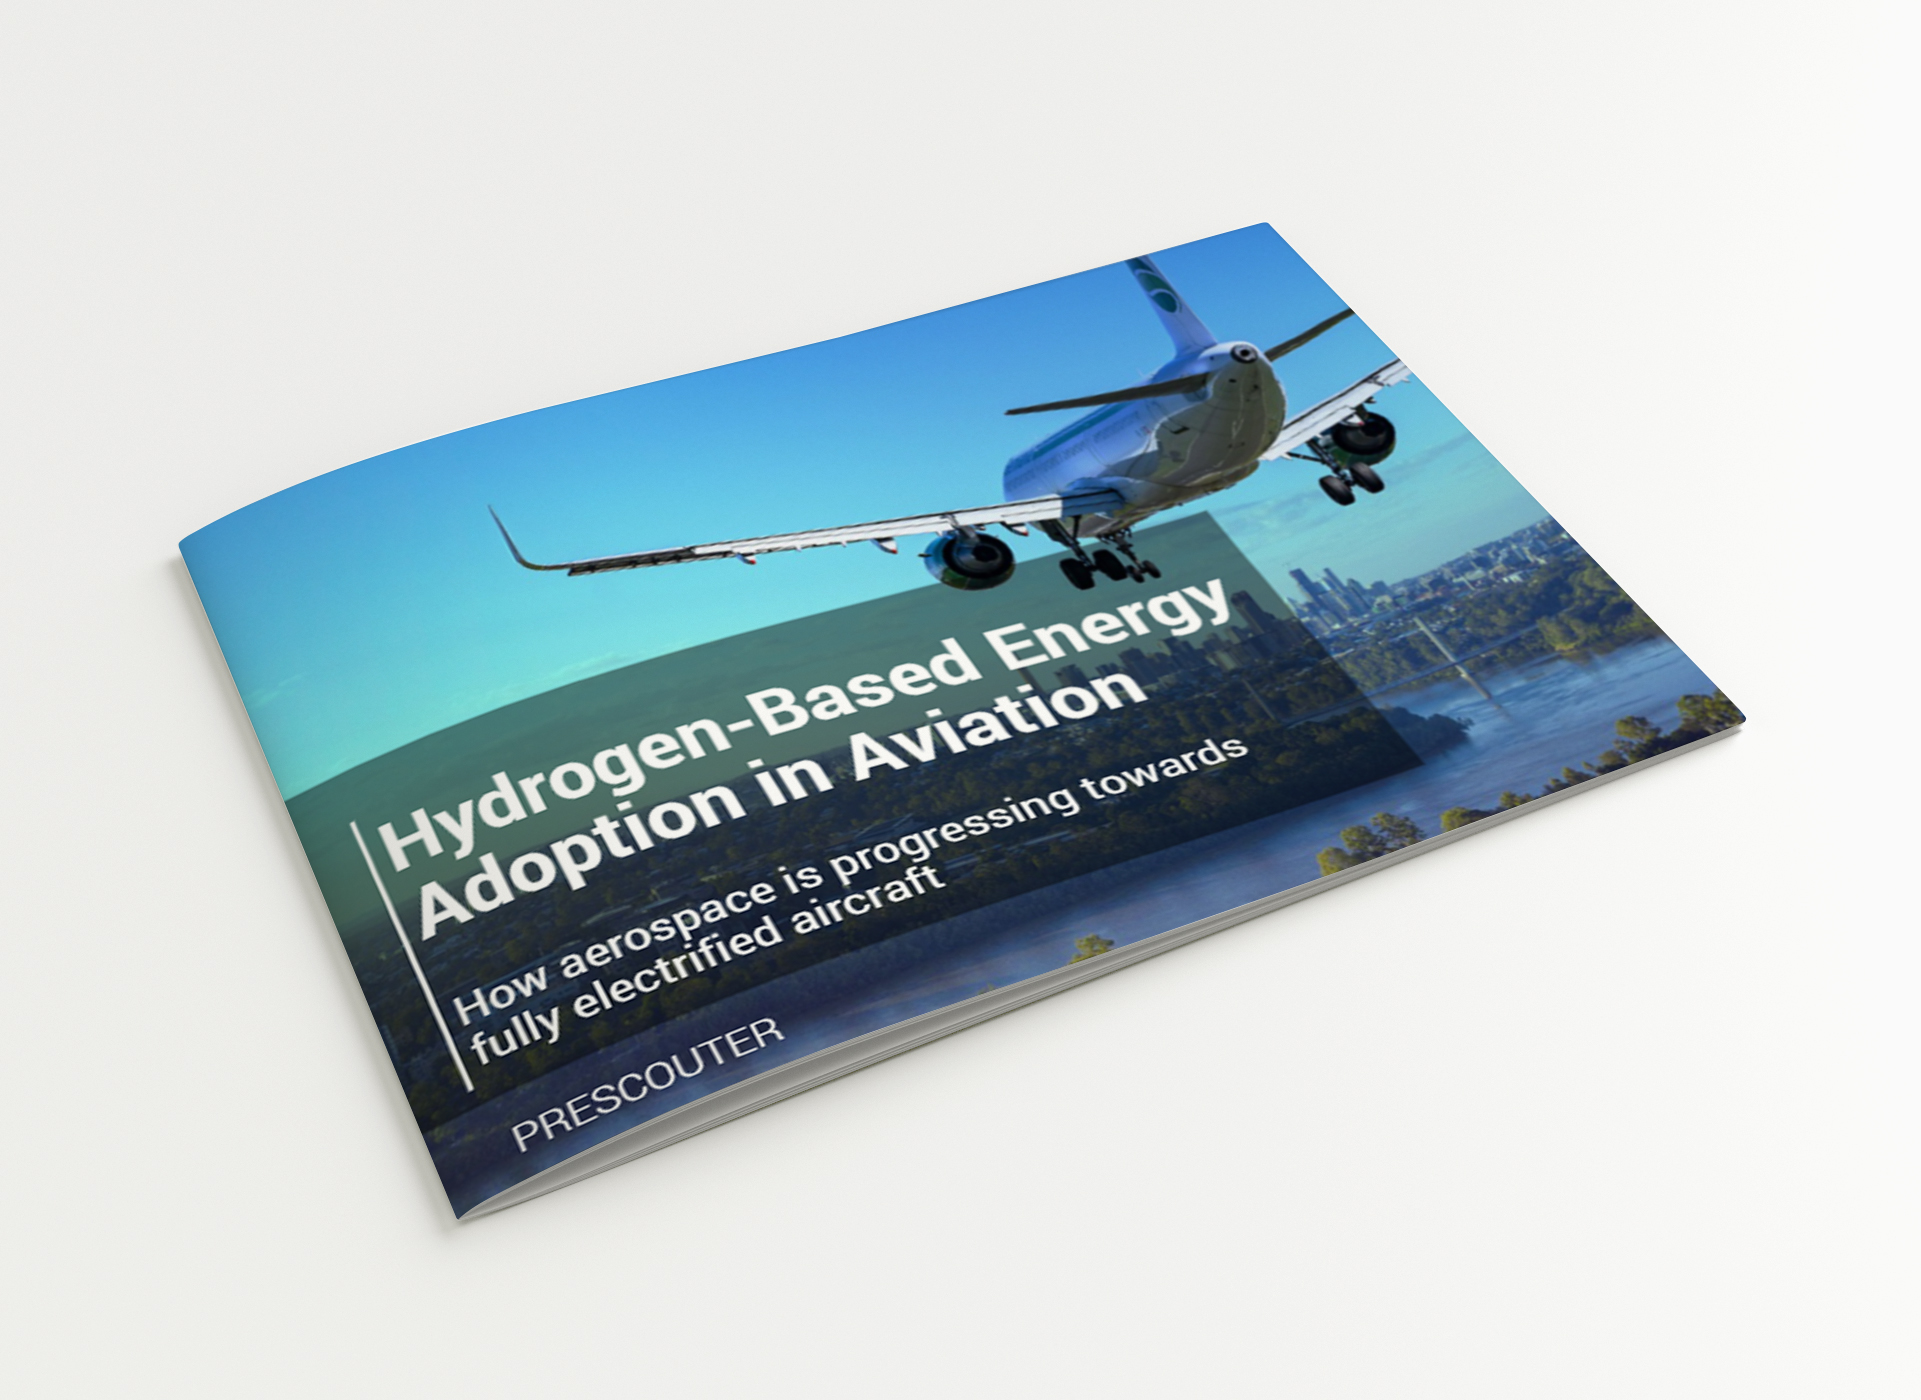 Hydrogen-Based Energy Adoption in Aviation